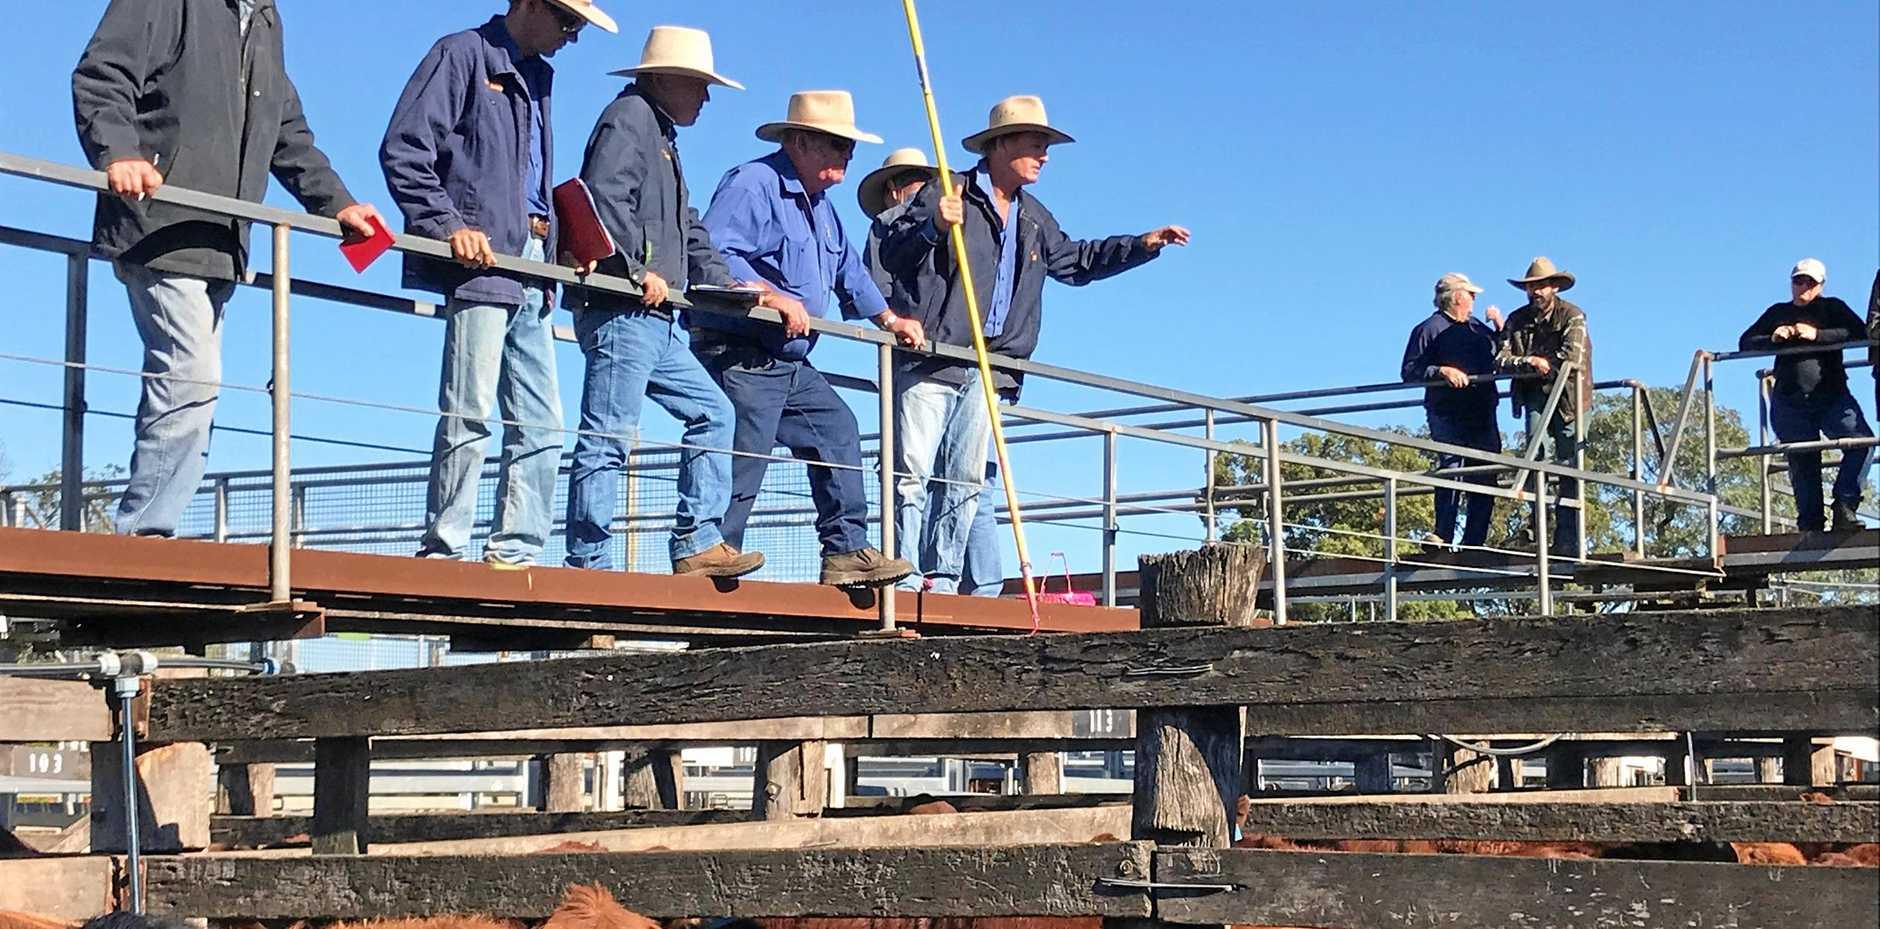 Plenty of action at the bi-annual weaner sales at South Burnett Livestock Exchange.